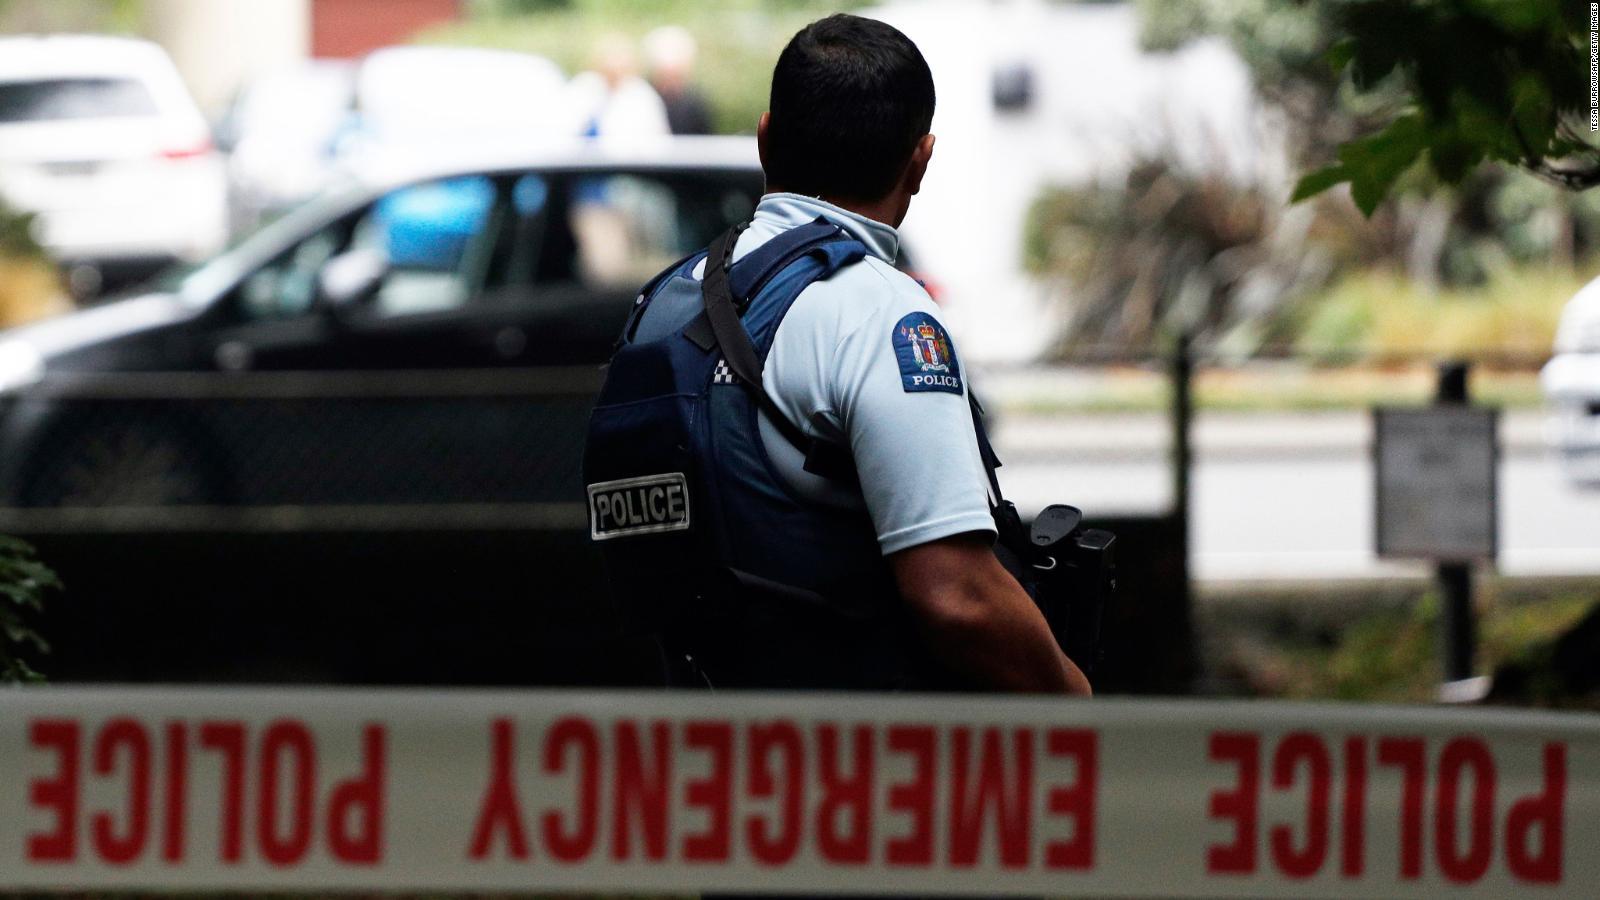 Online platforms scramble to remove terror attack videos